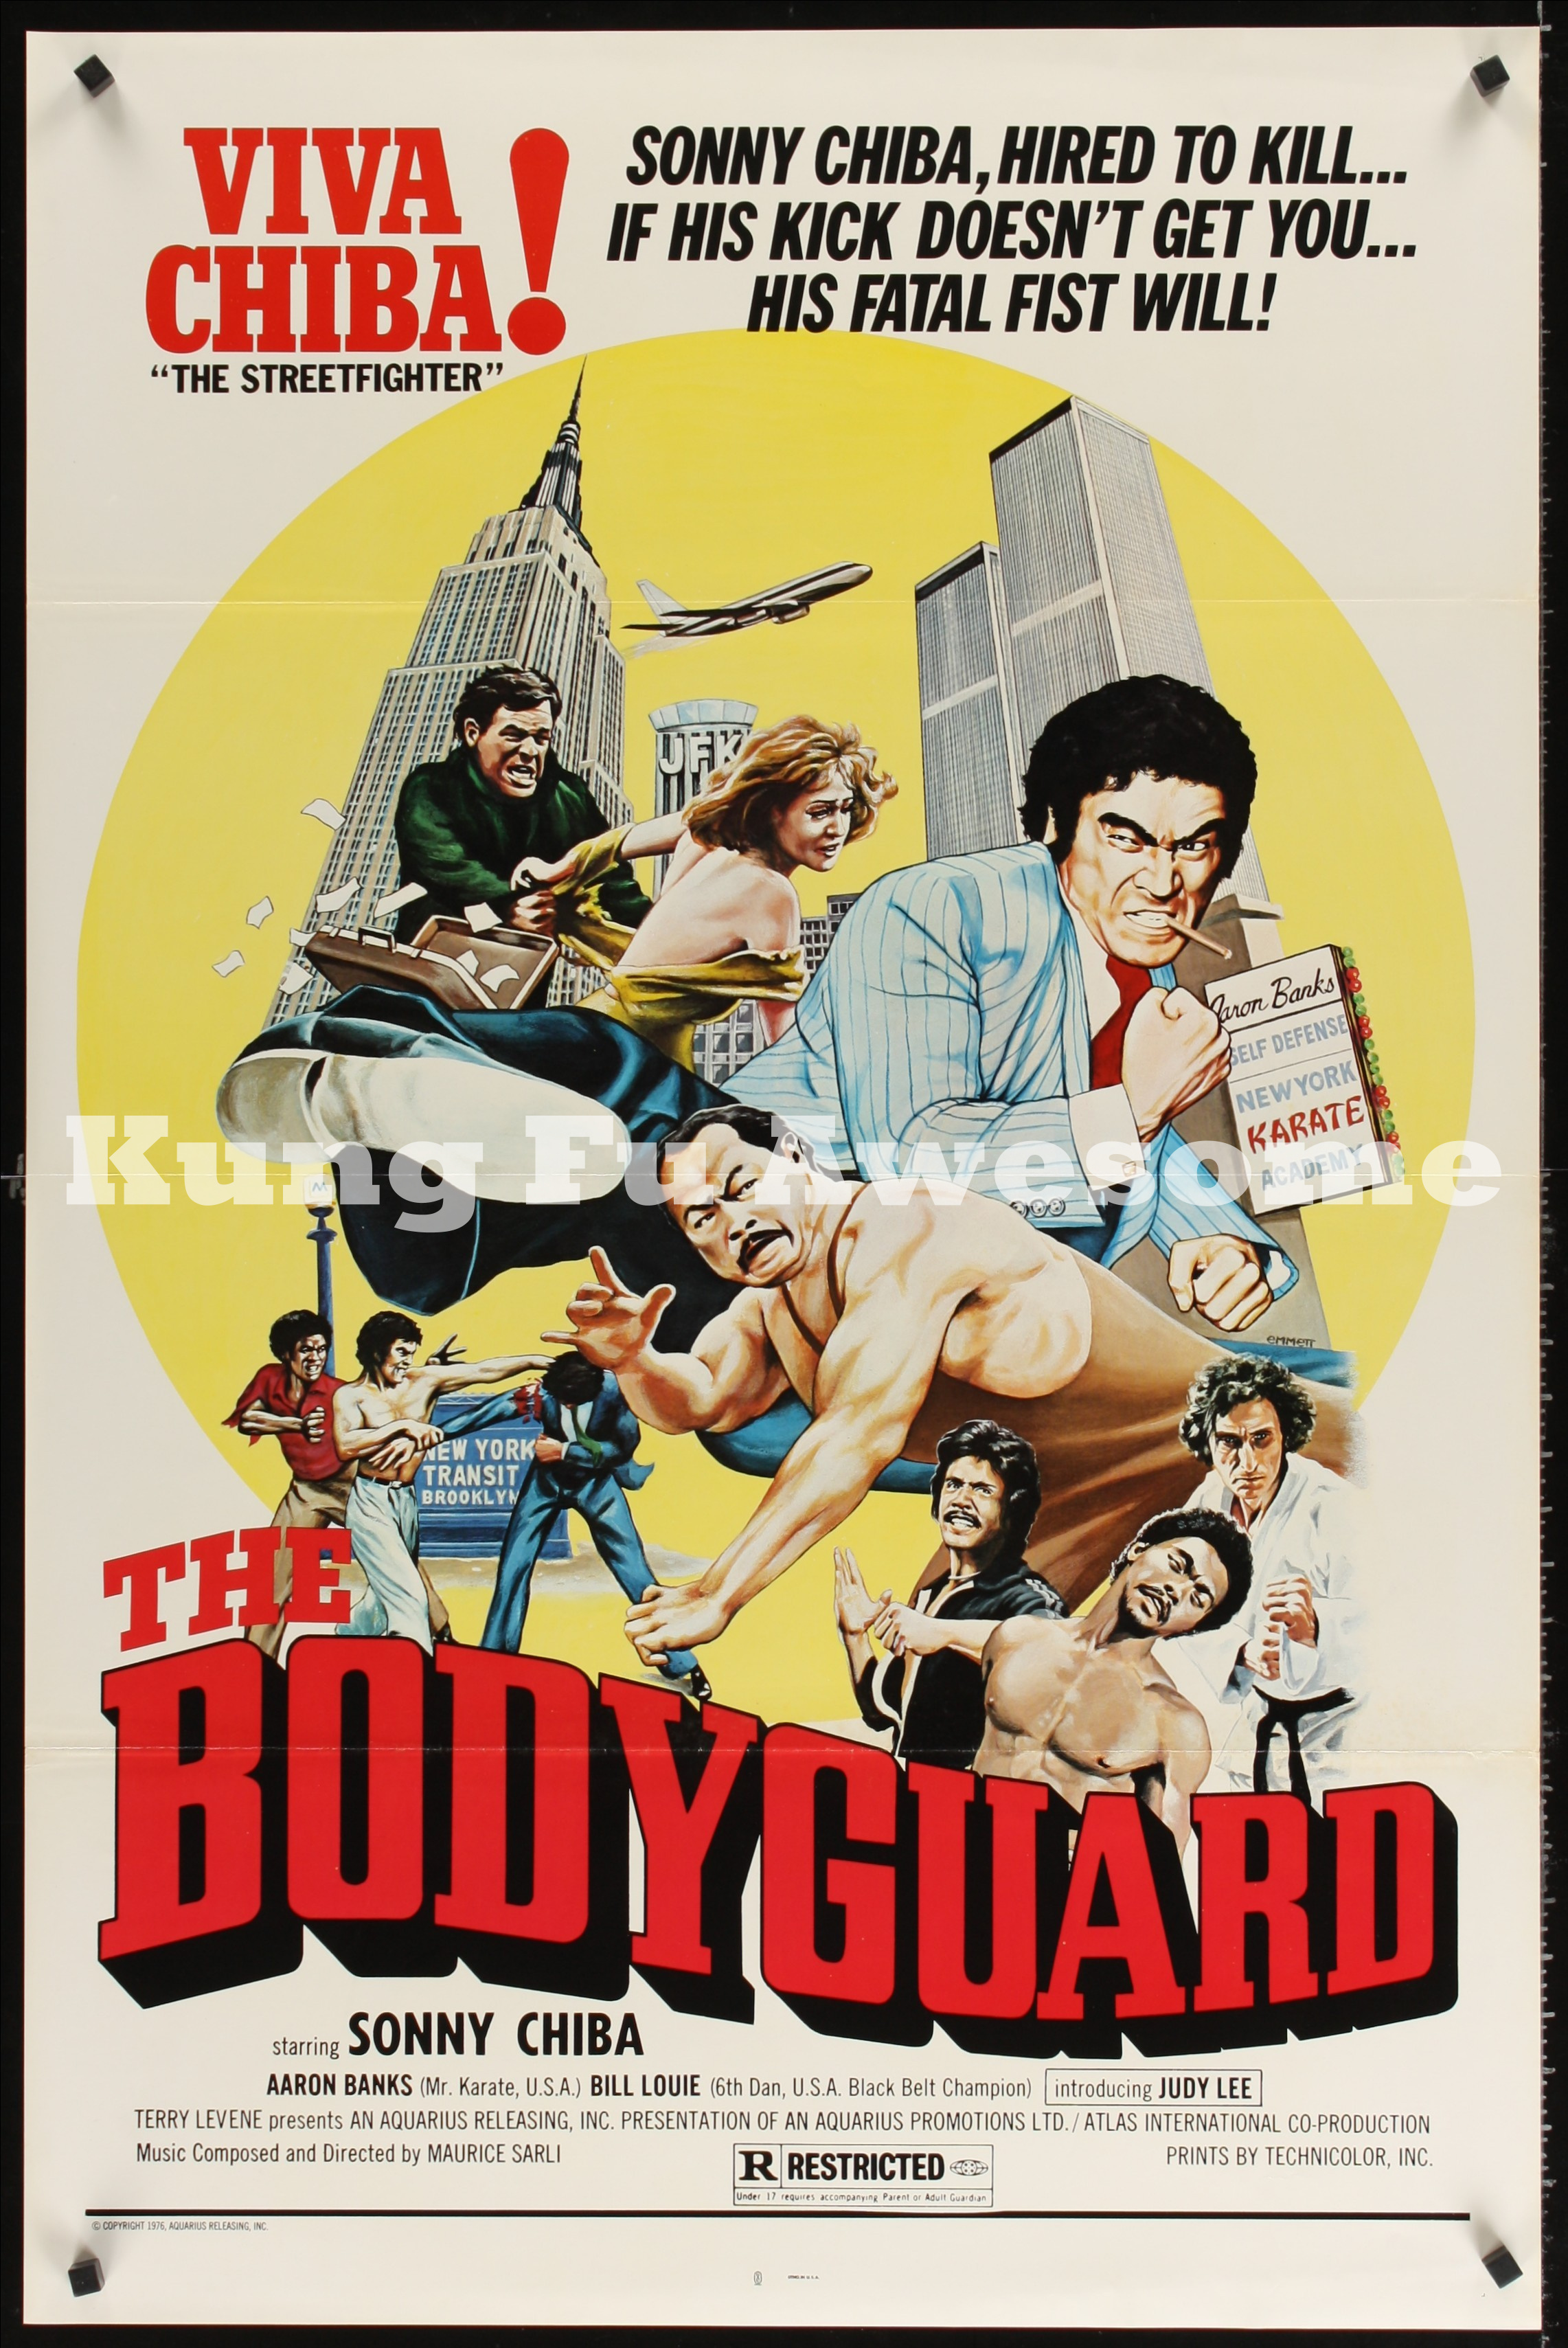 bodyguard_JC02220_L.jpg